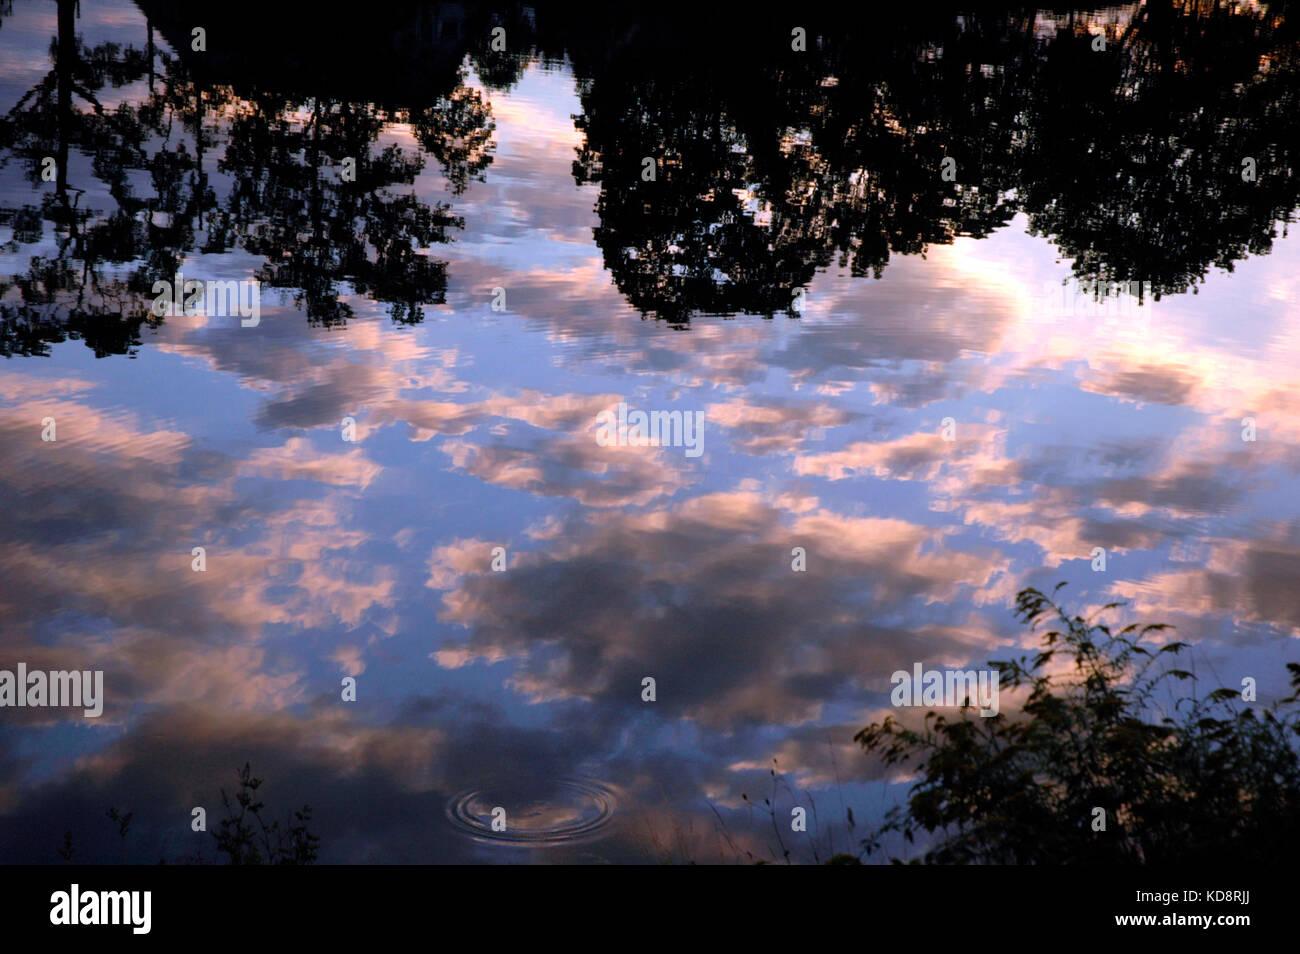 Reflections of clouds in the evening sun on the river Neckar, Stuttgart, Baden-Würtenberg, Germany Stock Photo